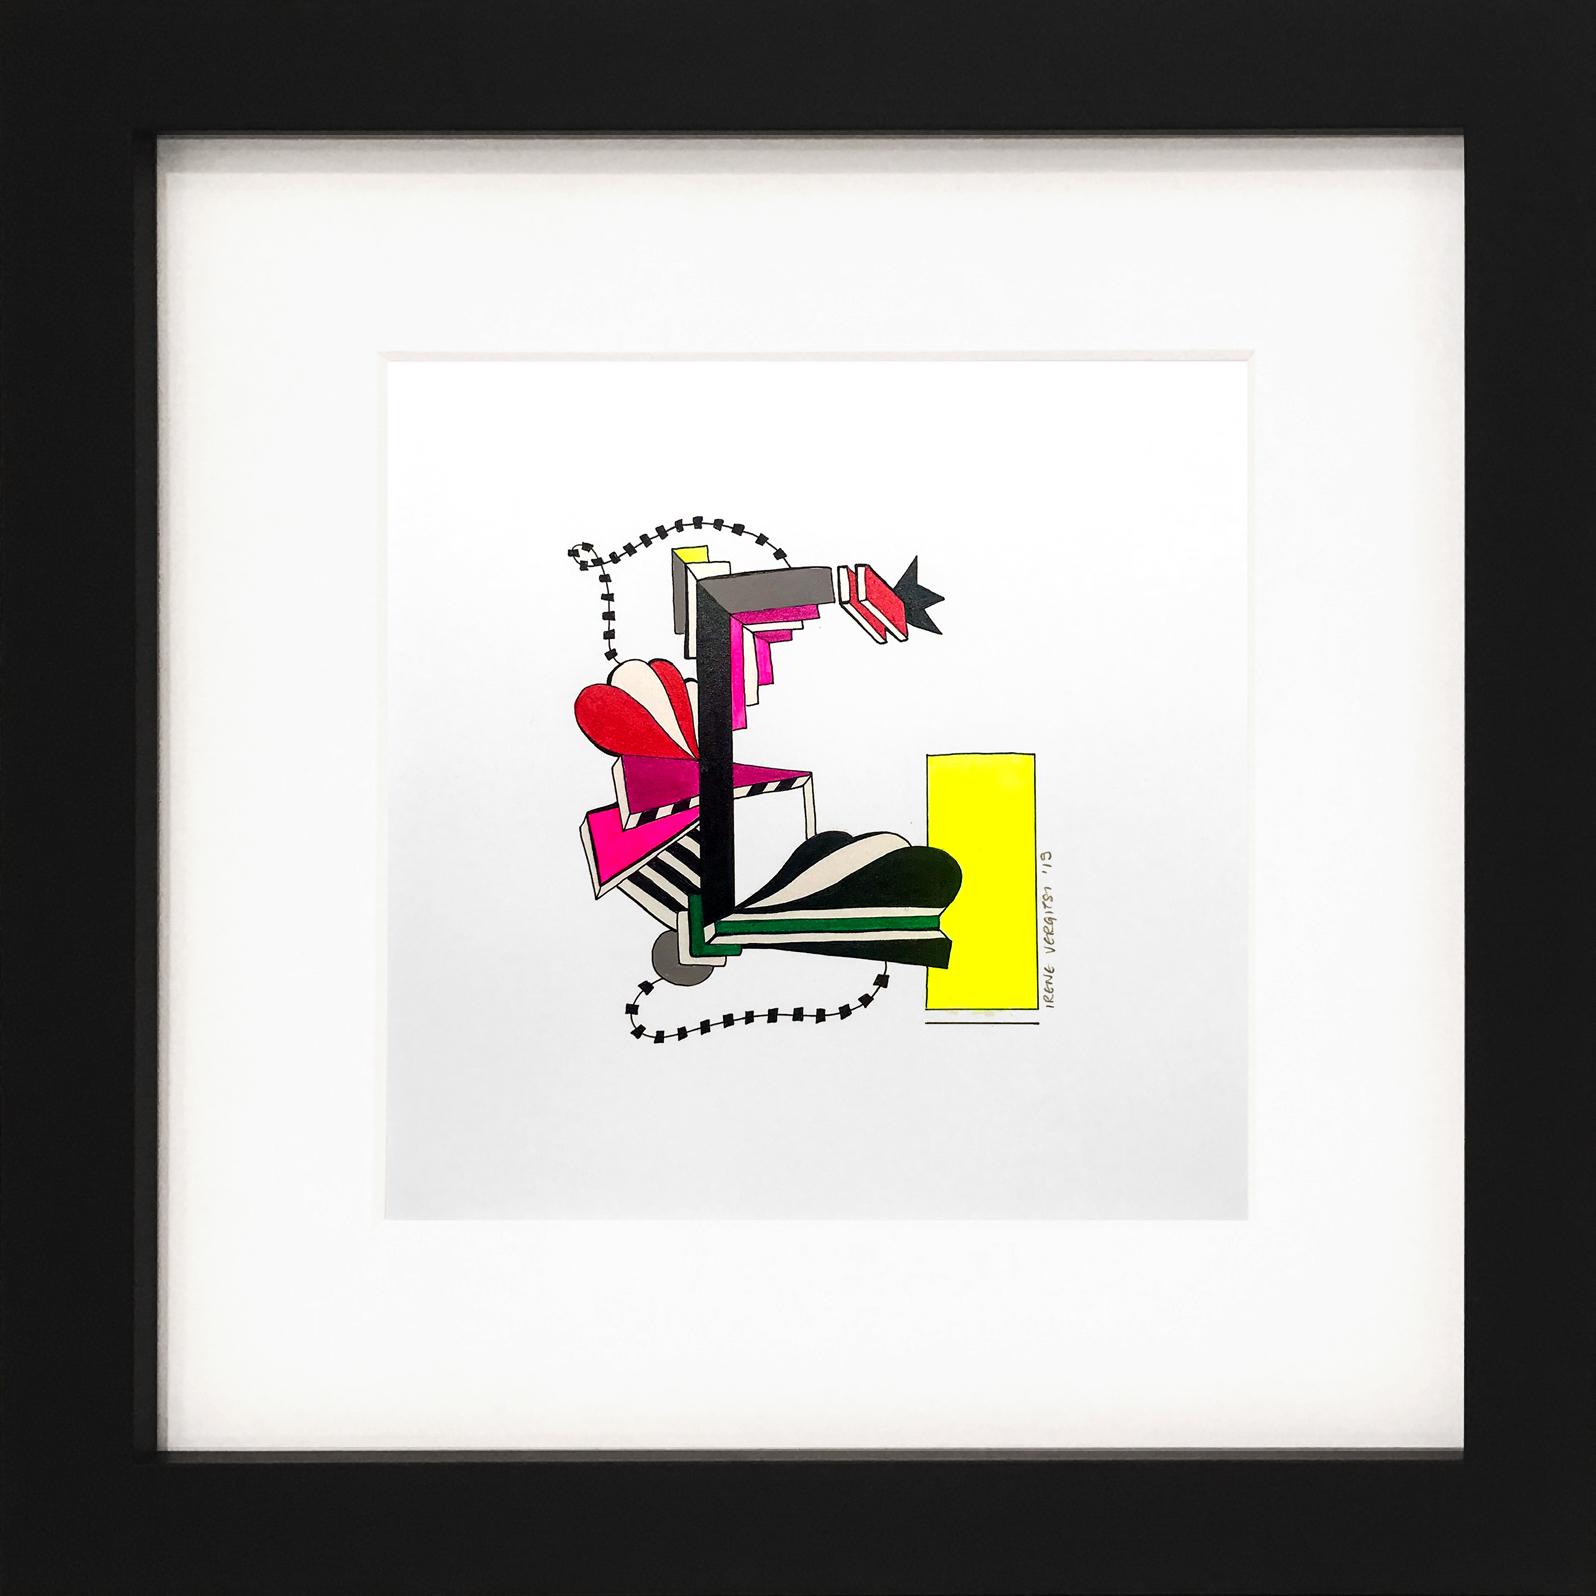 .E_1 in frame